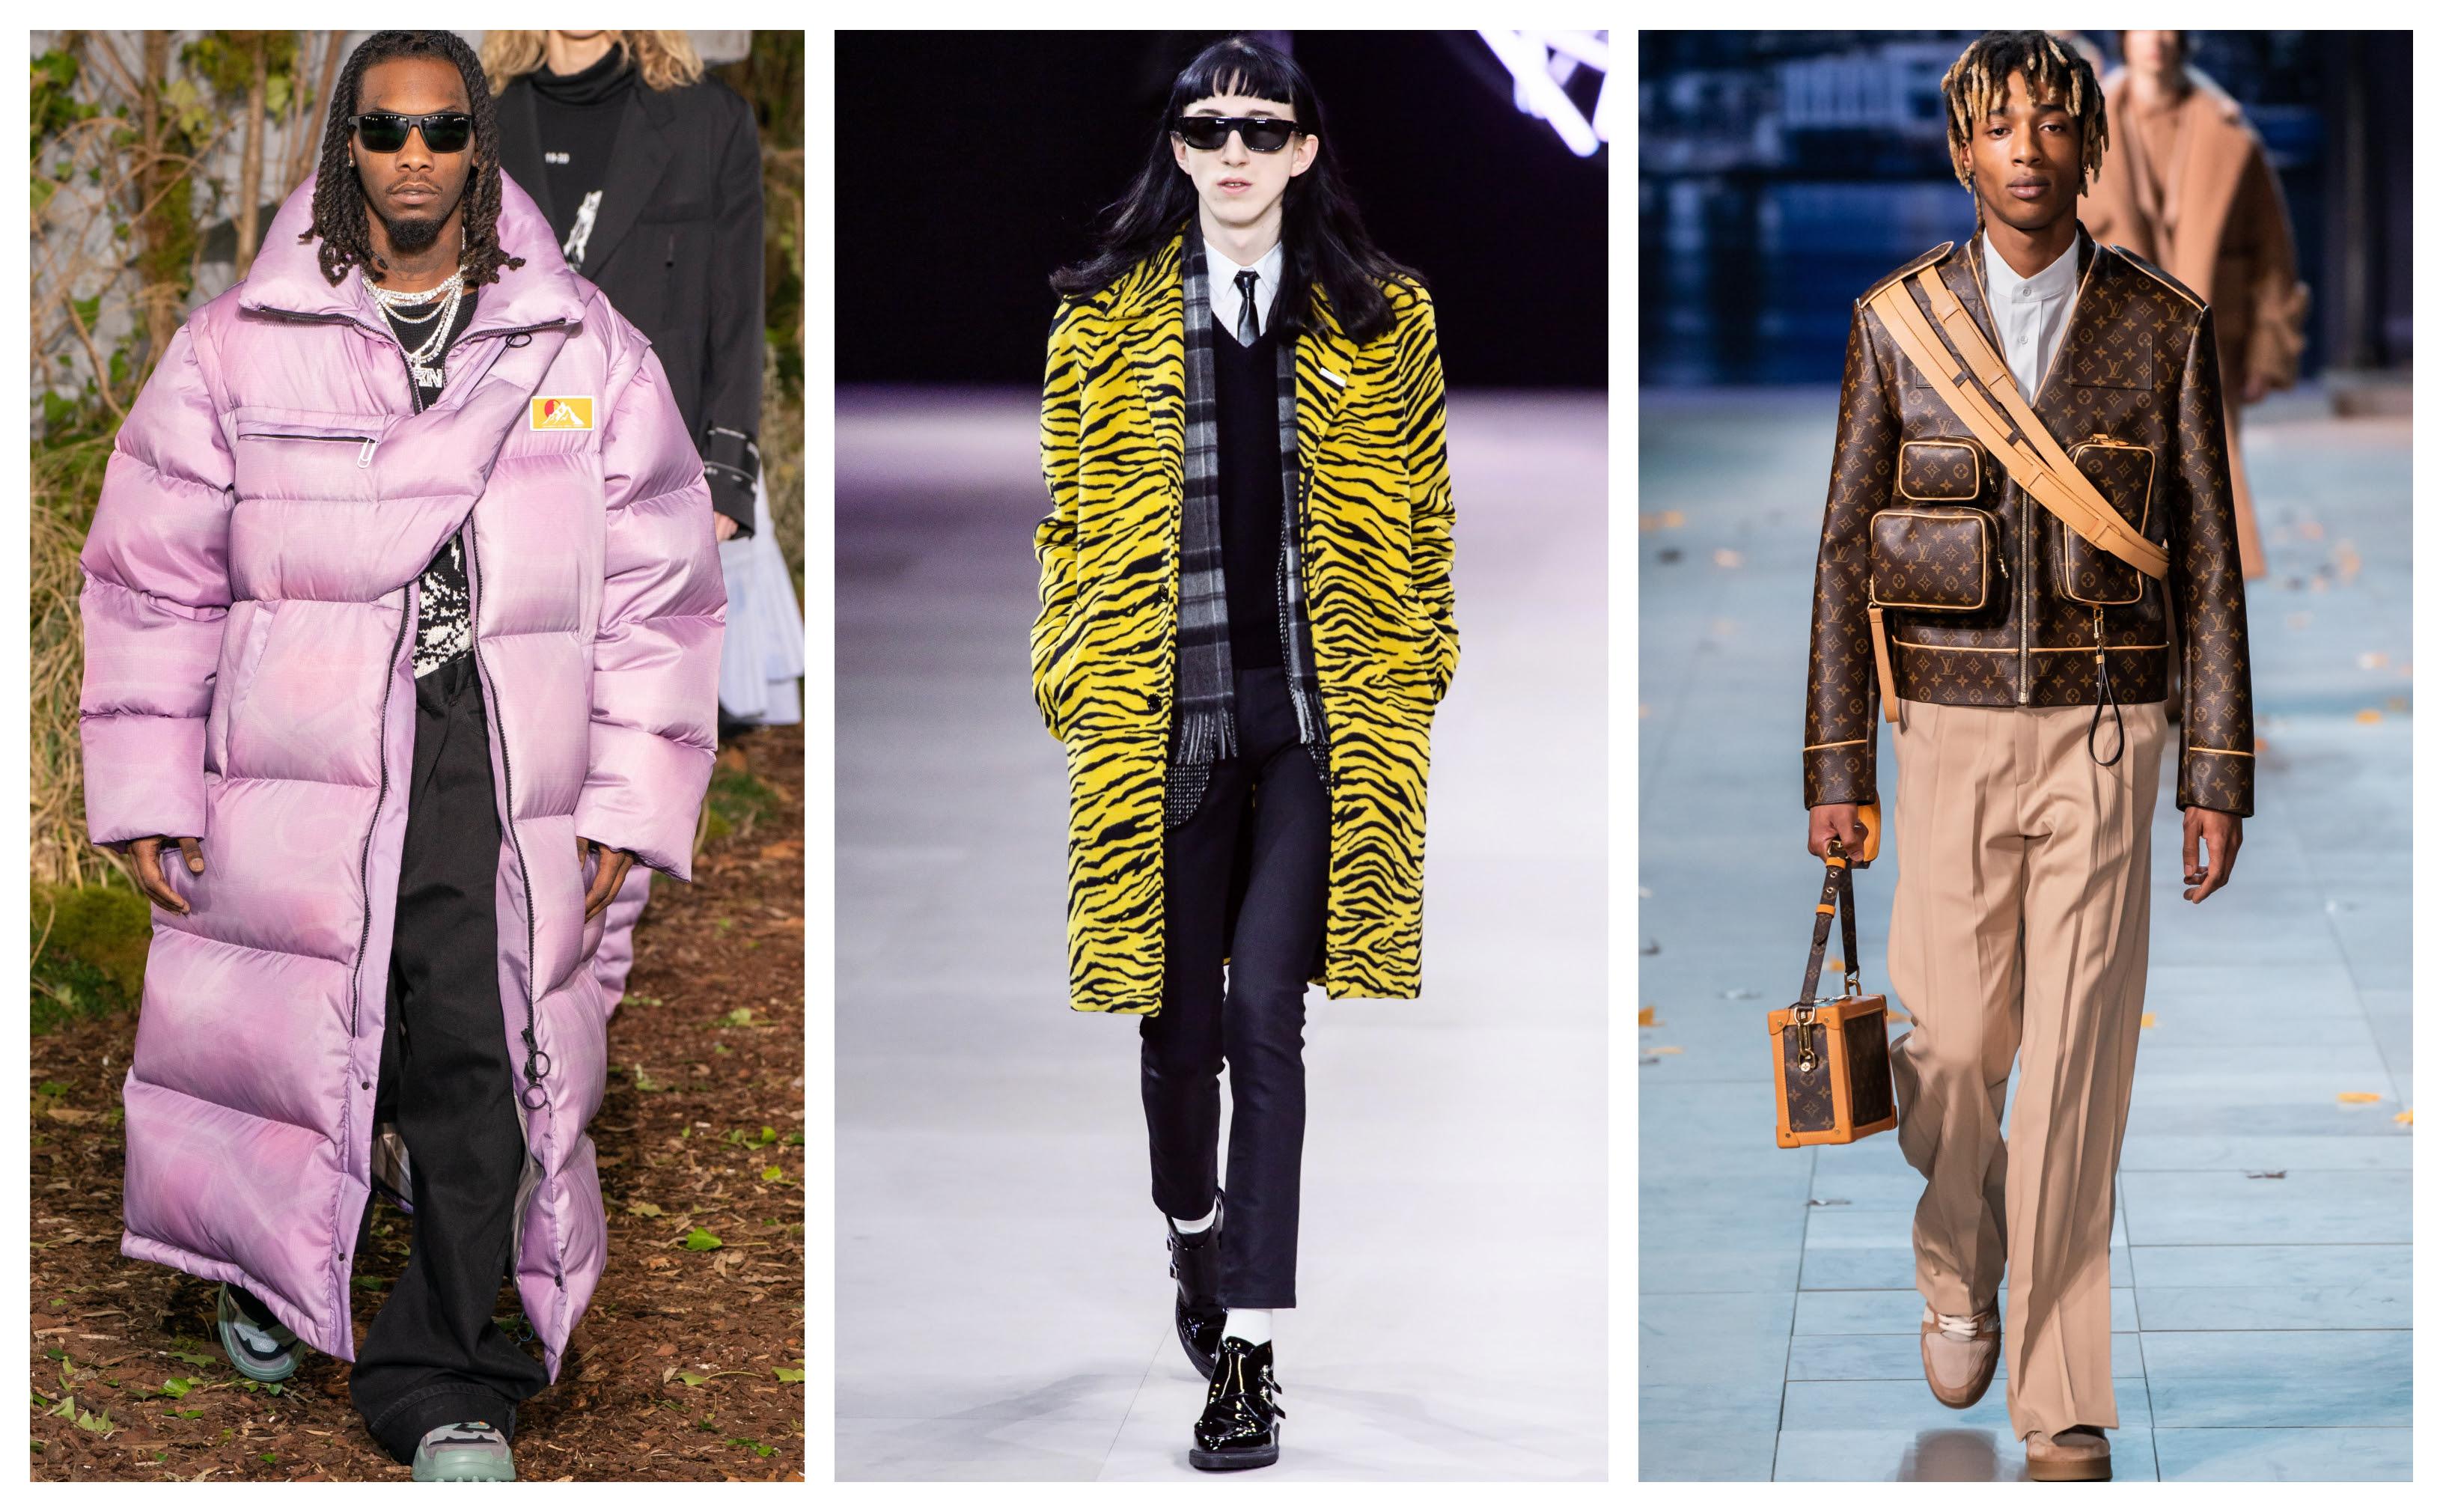 paris fashion week men's fallwinter 2019 trend report